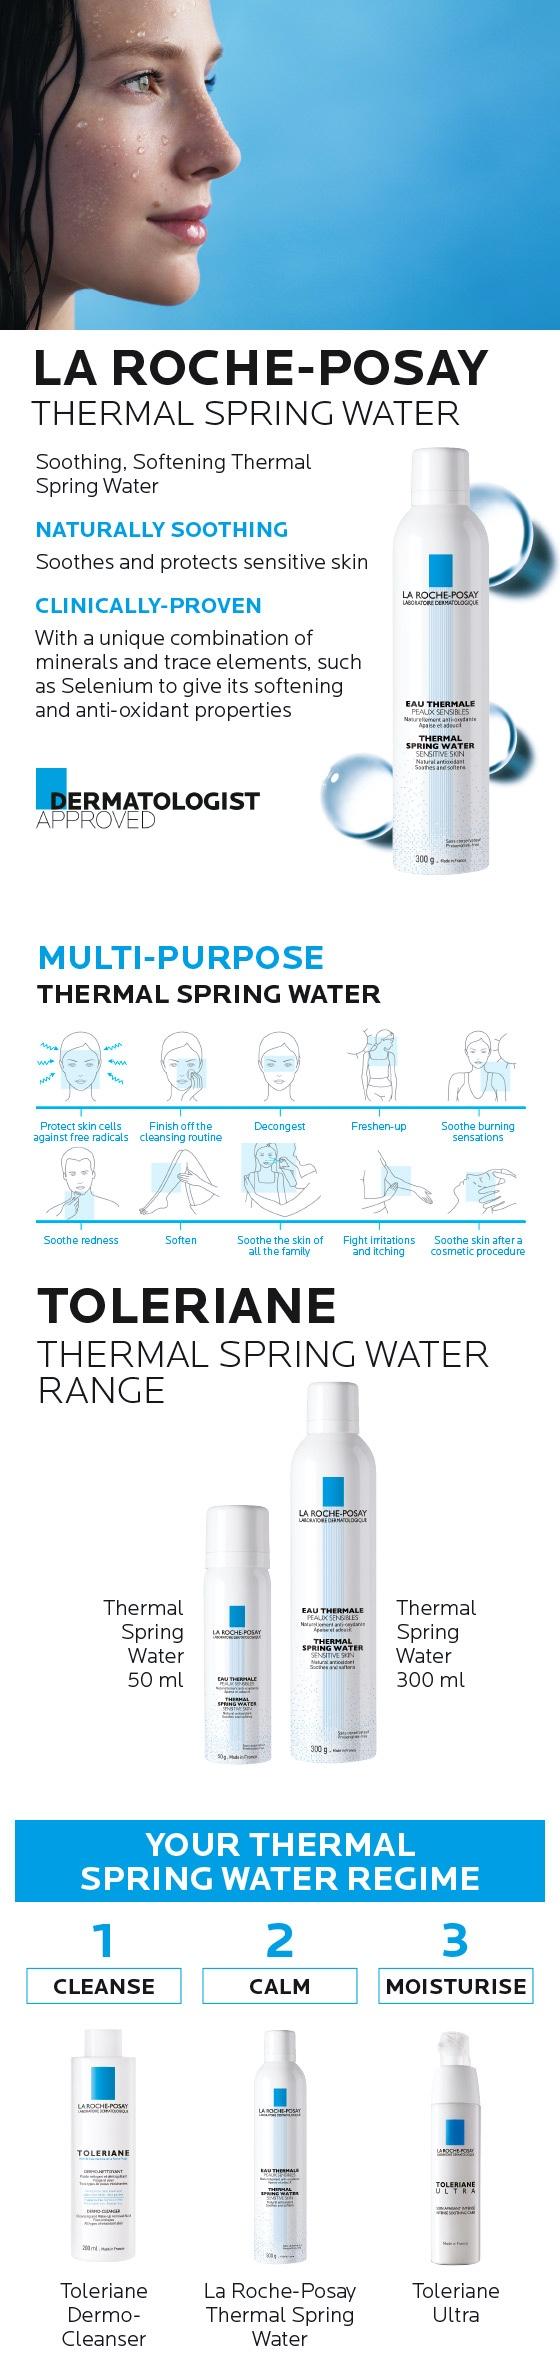 La Roche-Posay Thermal Spring Water 300ml